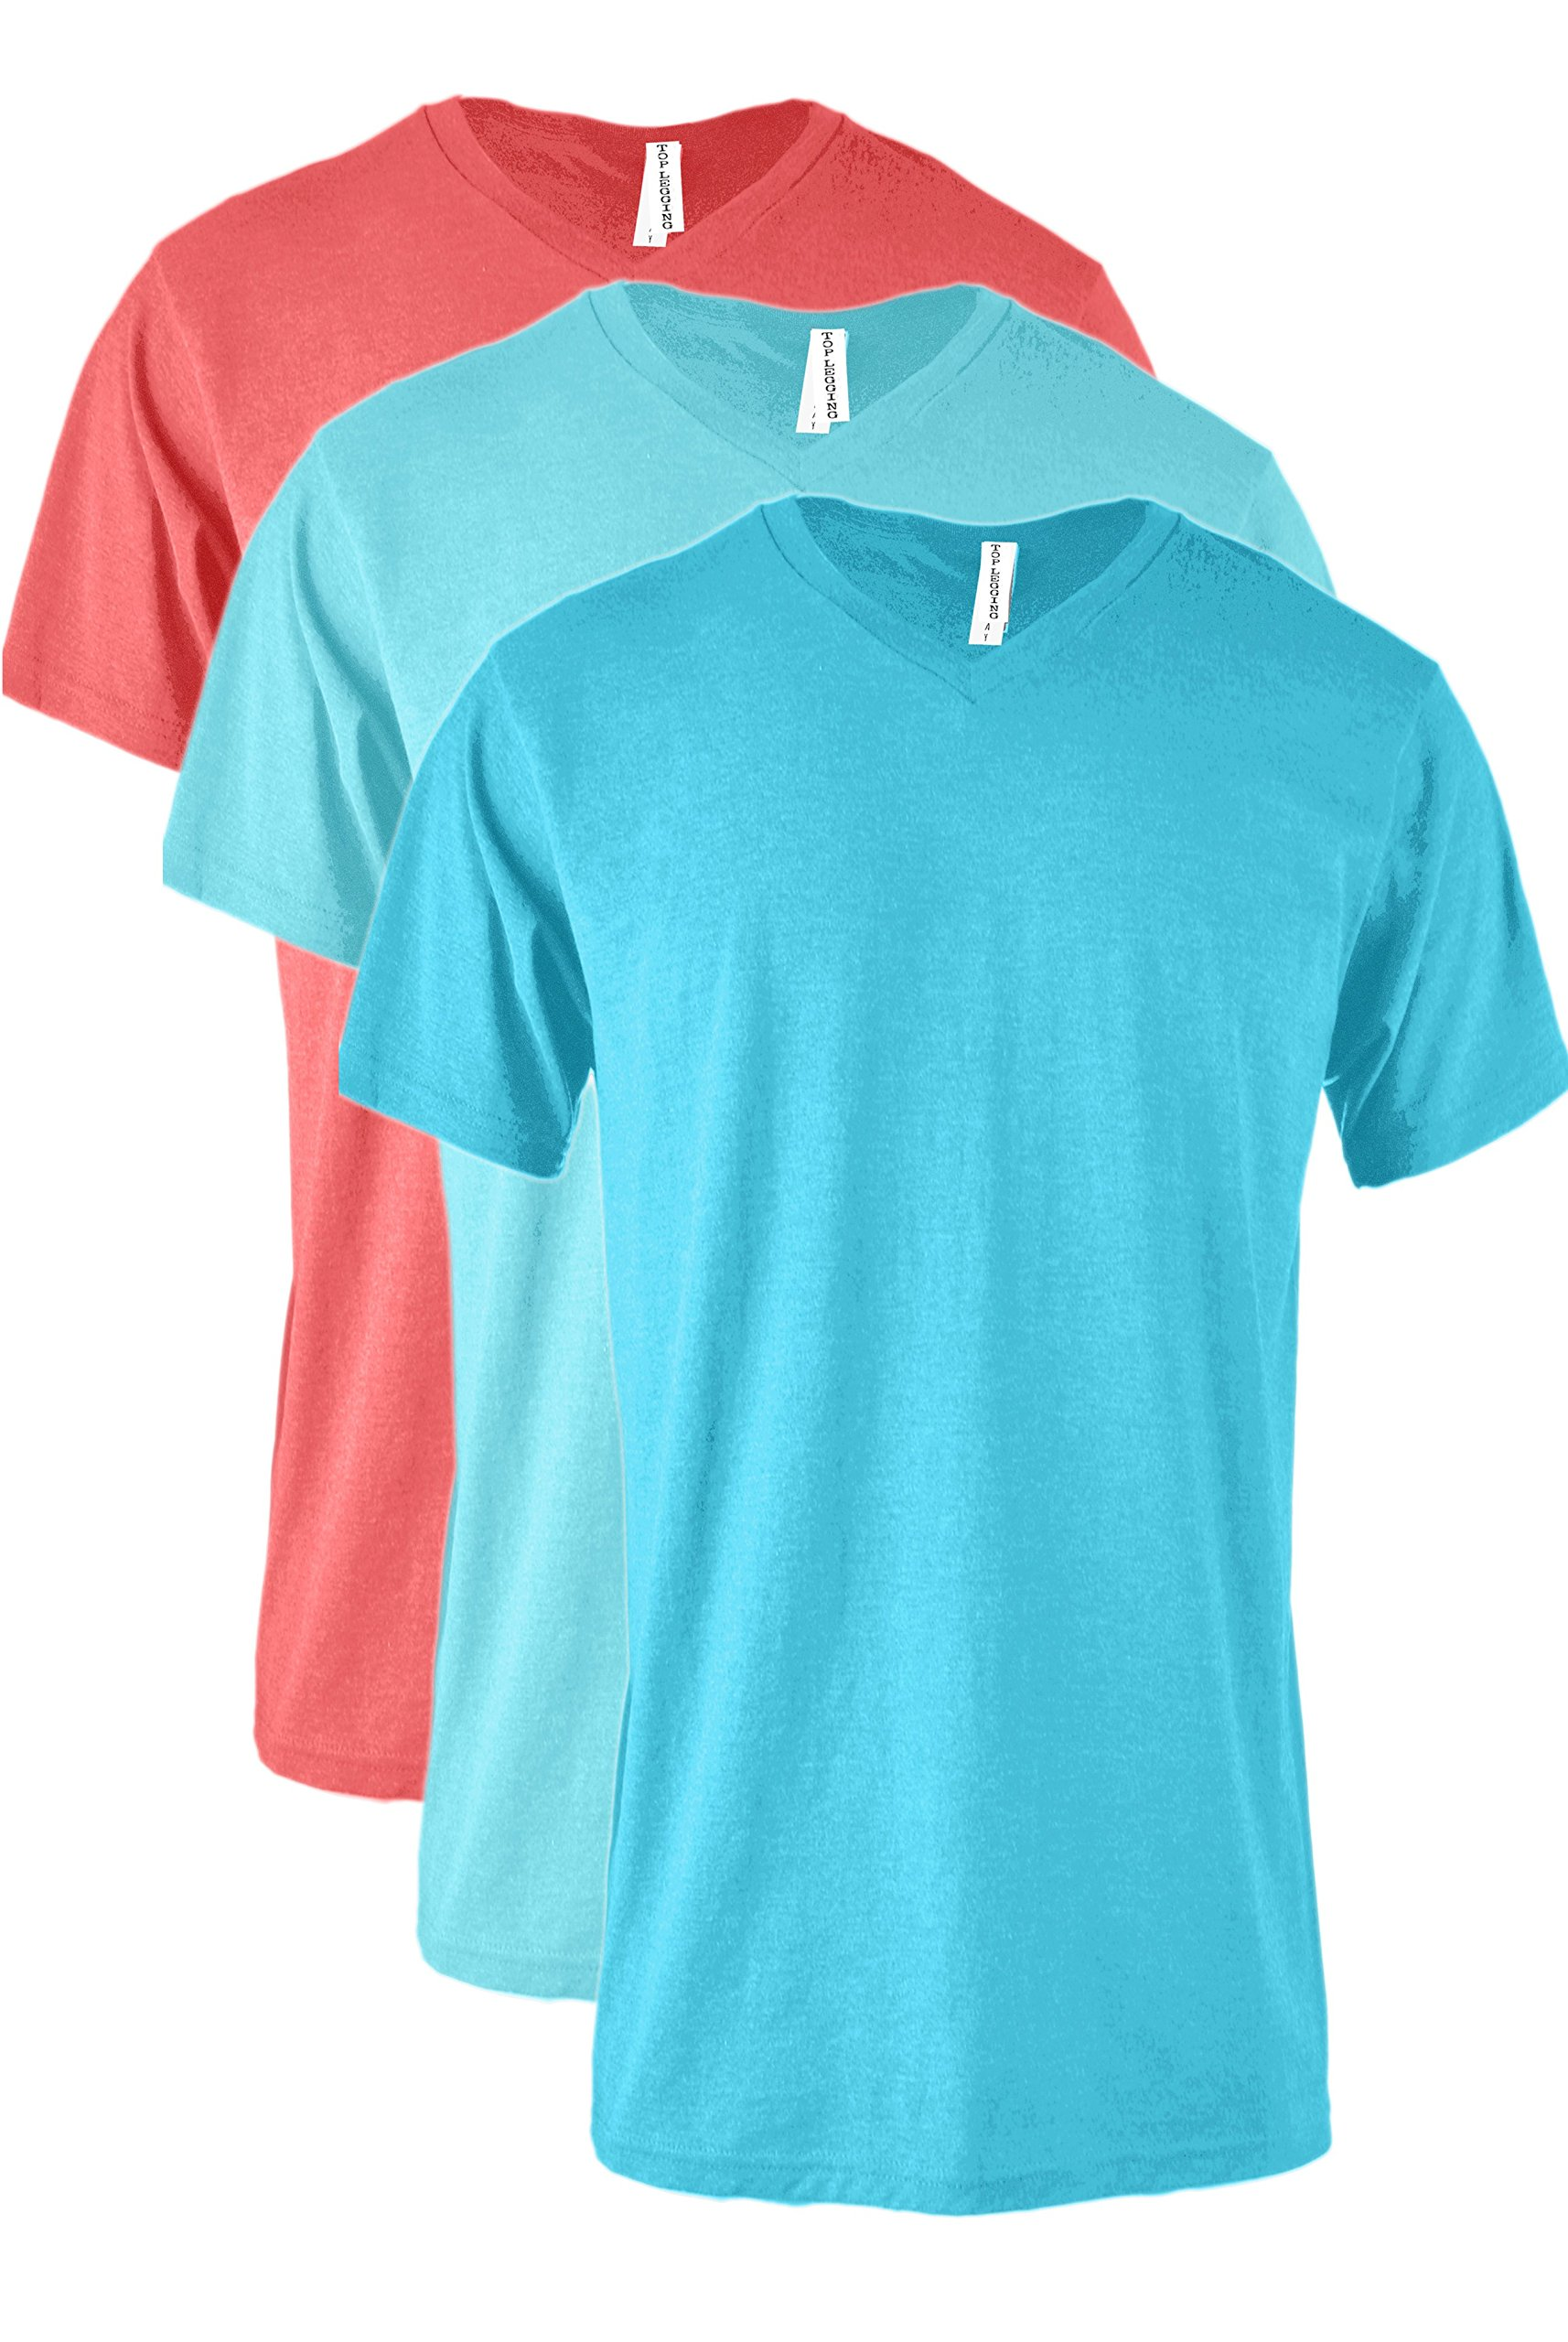 379169b9d3e3 Galleon - TOP LEGGING TL Men Casual Basic Short Sleeve Tri-Blend/100% Cotton  V-Neck T Shirt RVNKSET3_Turq_COR_PACBLUE 2XL